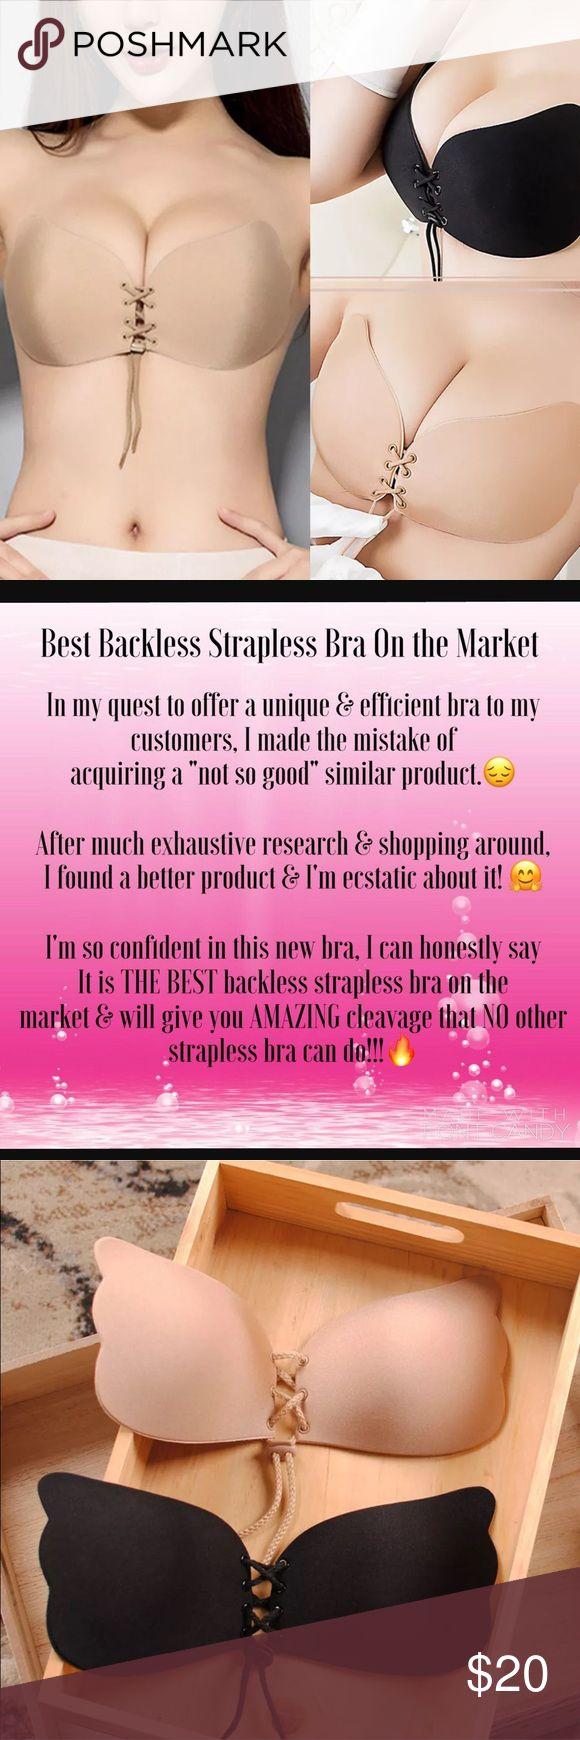 25 best ideas about backless bra on pinterest low back